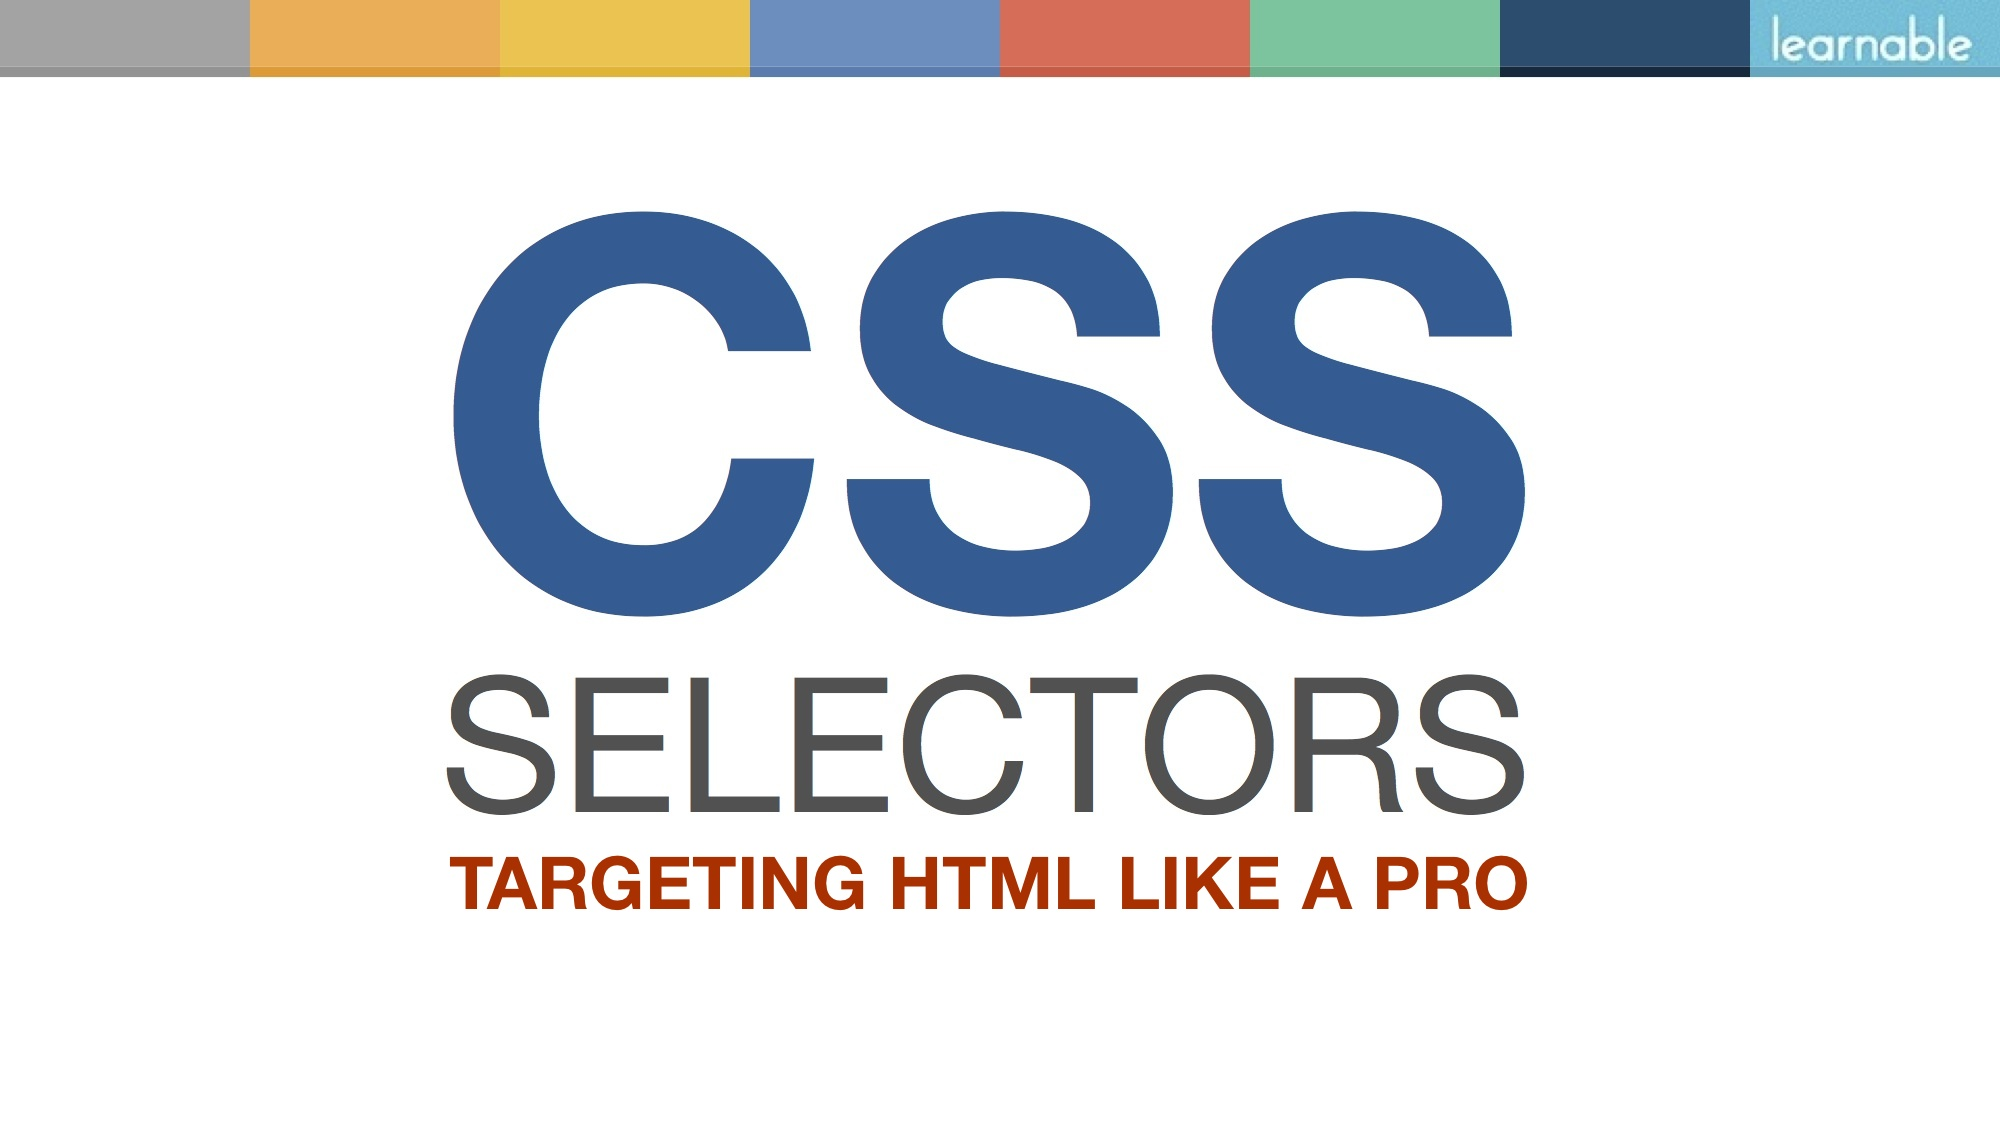 CSS Selectors: Targeting HTML Like a Pro